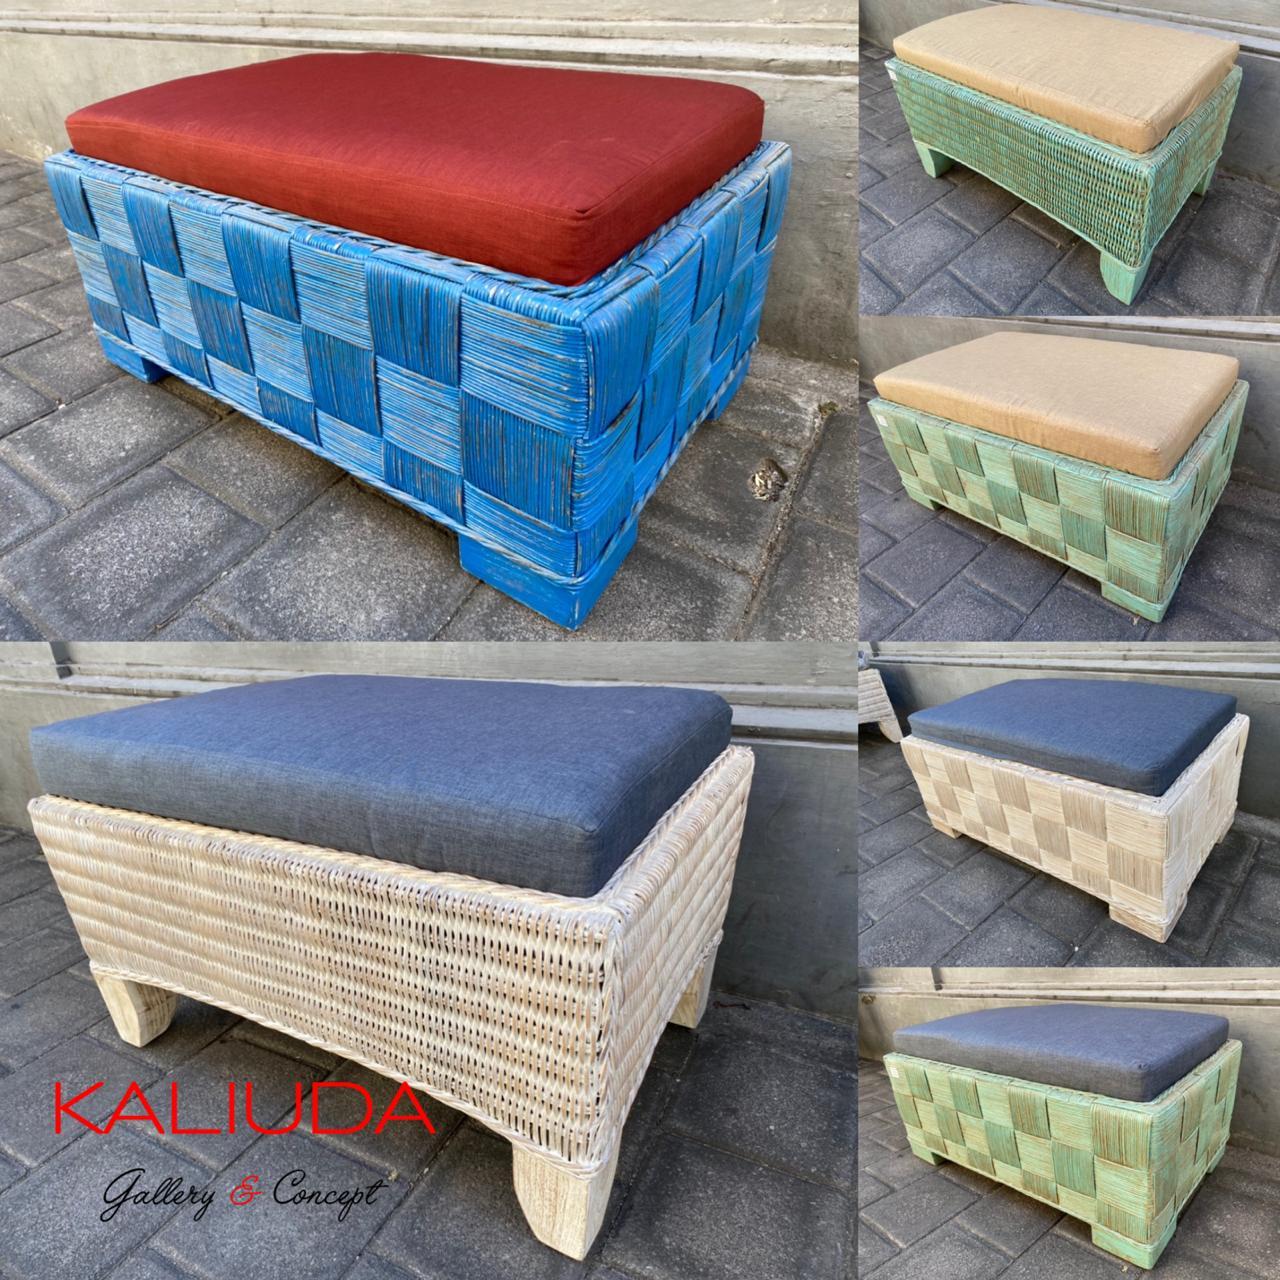 Rattan furniture by Kaliuda Gallery